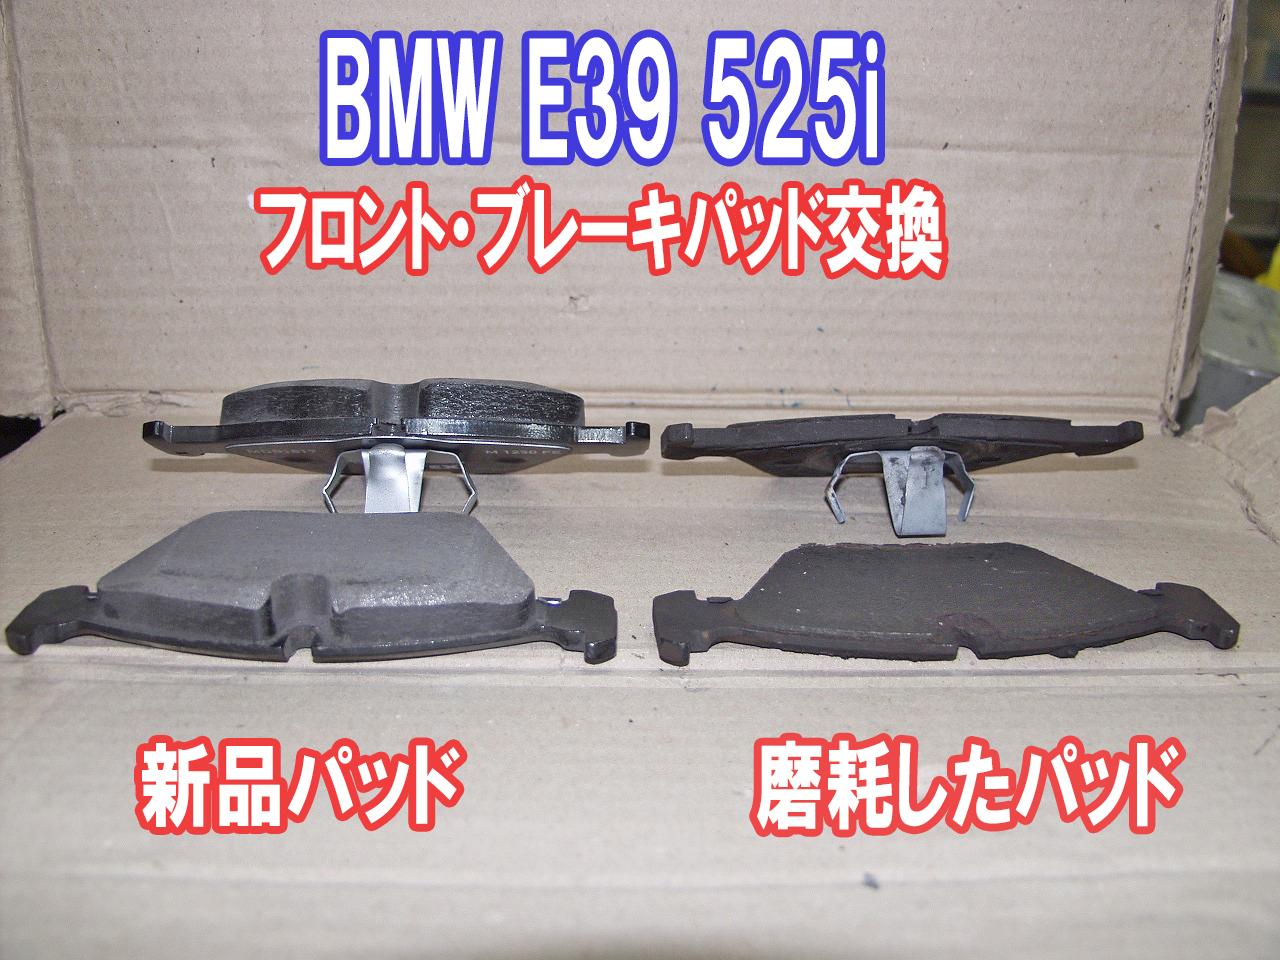 BMW 525iのブレーキパッド交換は社外部品がお得です。